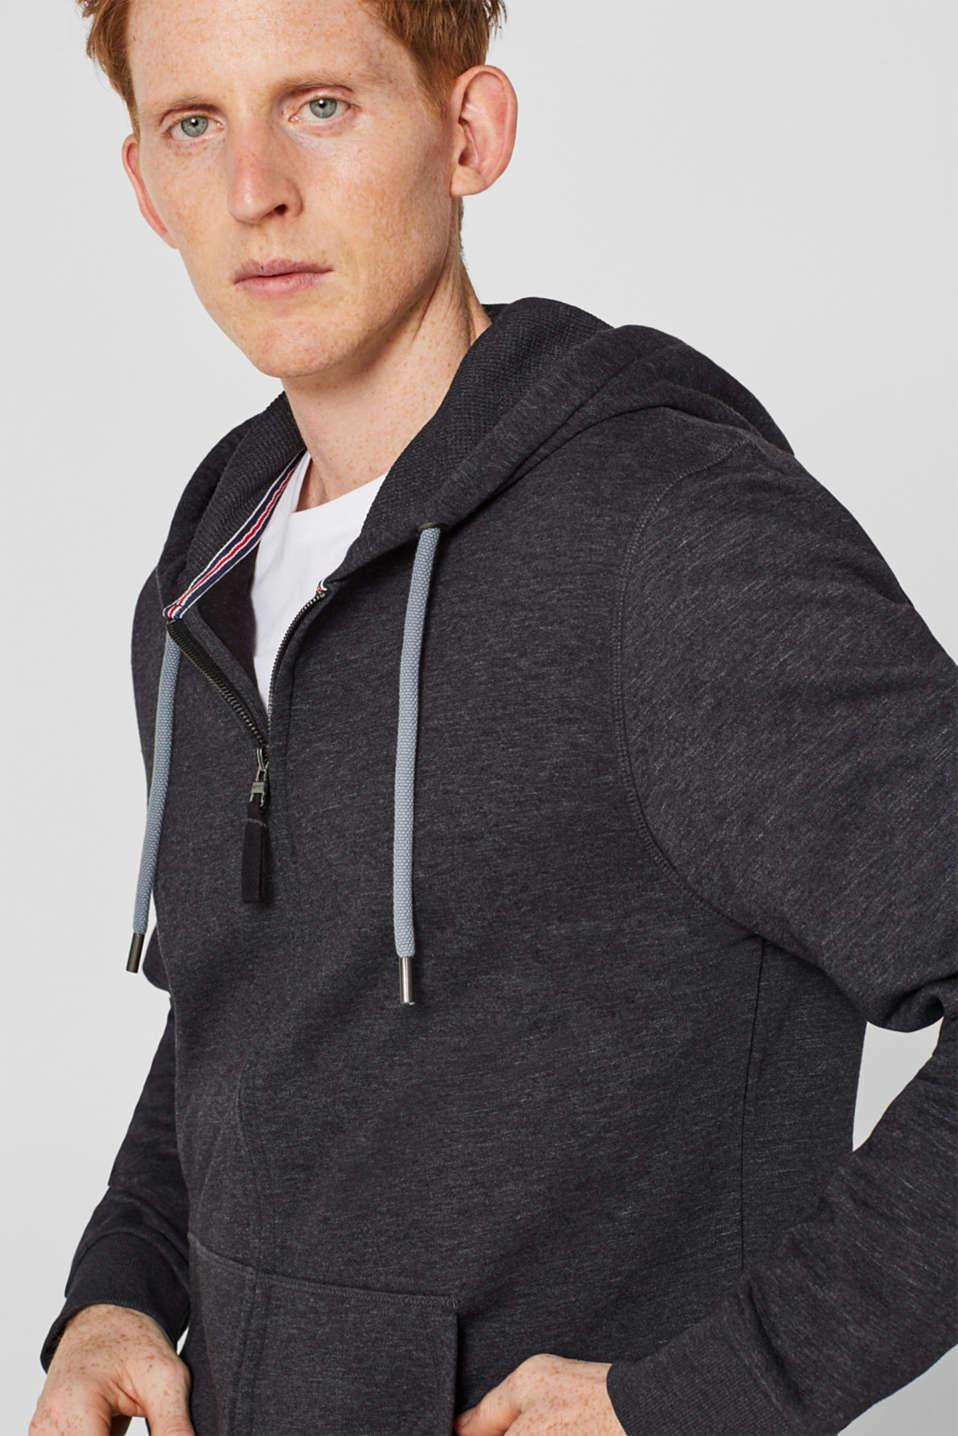 Hooded sweatshirt cardigan, ANTHRACITE, detail image number 2